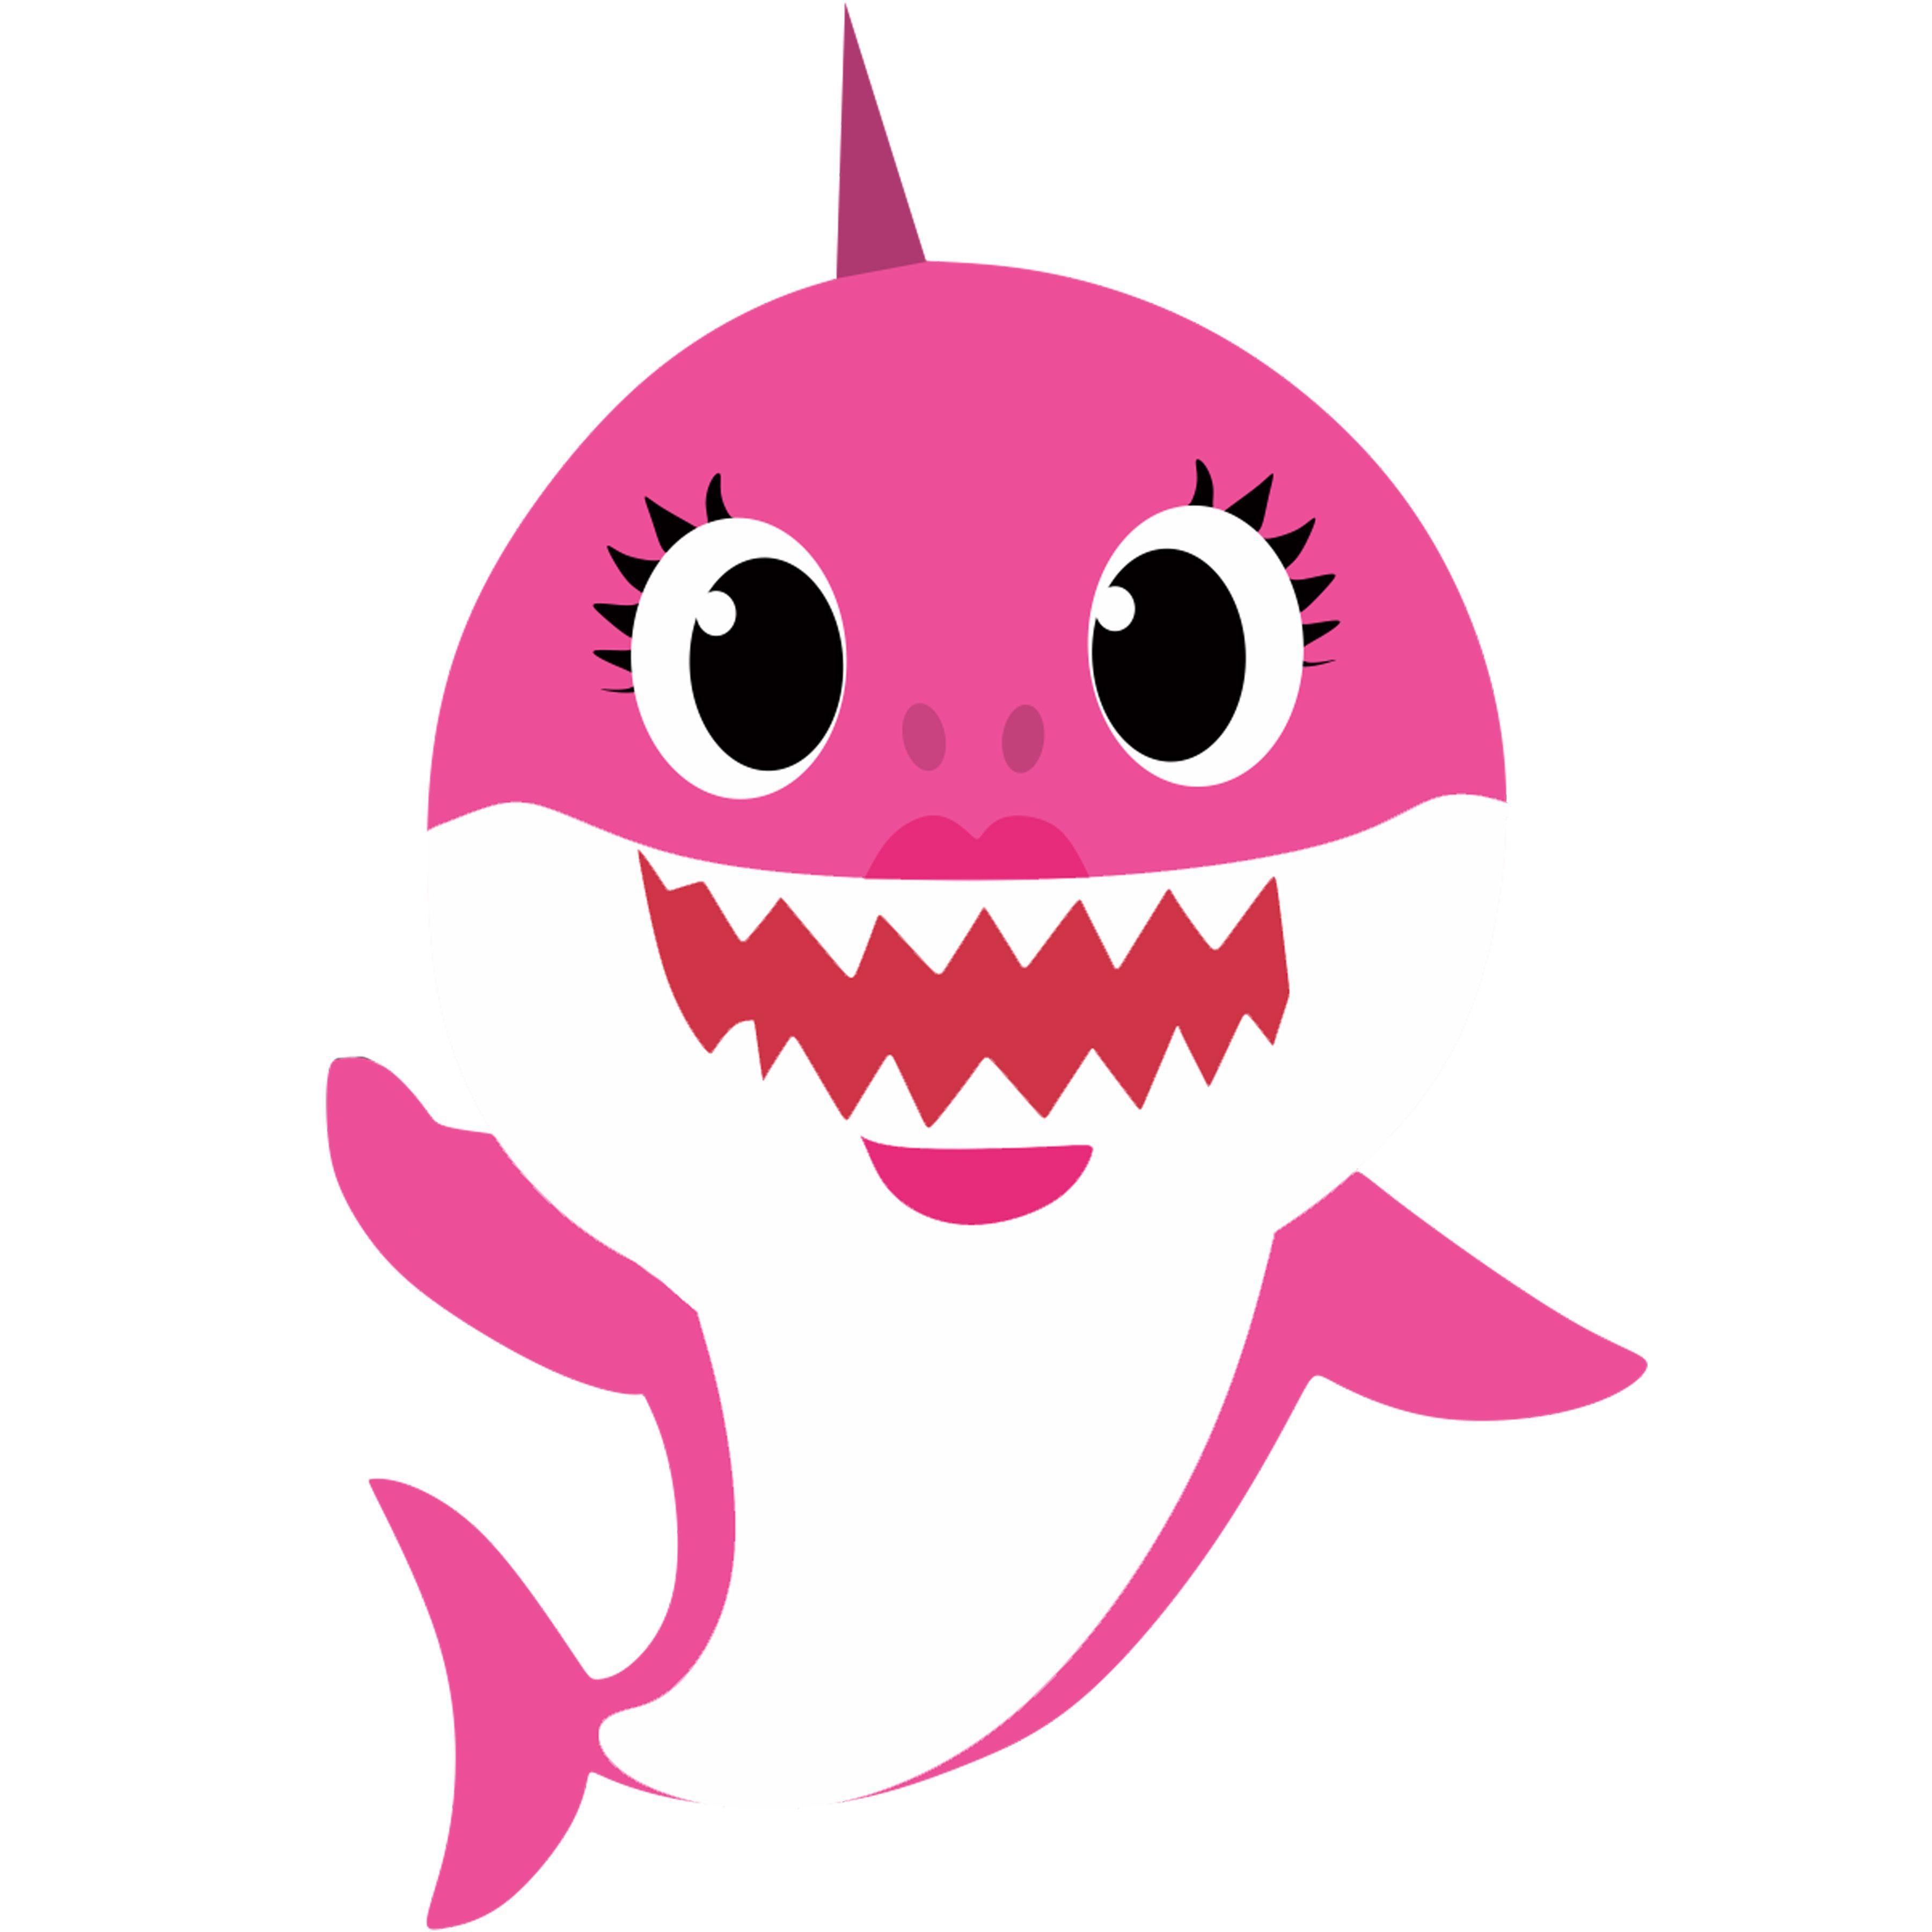 #babyshark #sharkfamily #mommyshark #daddyshark